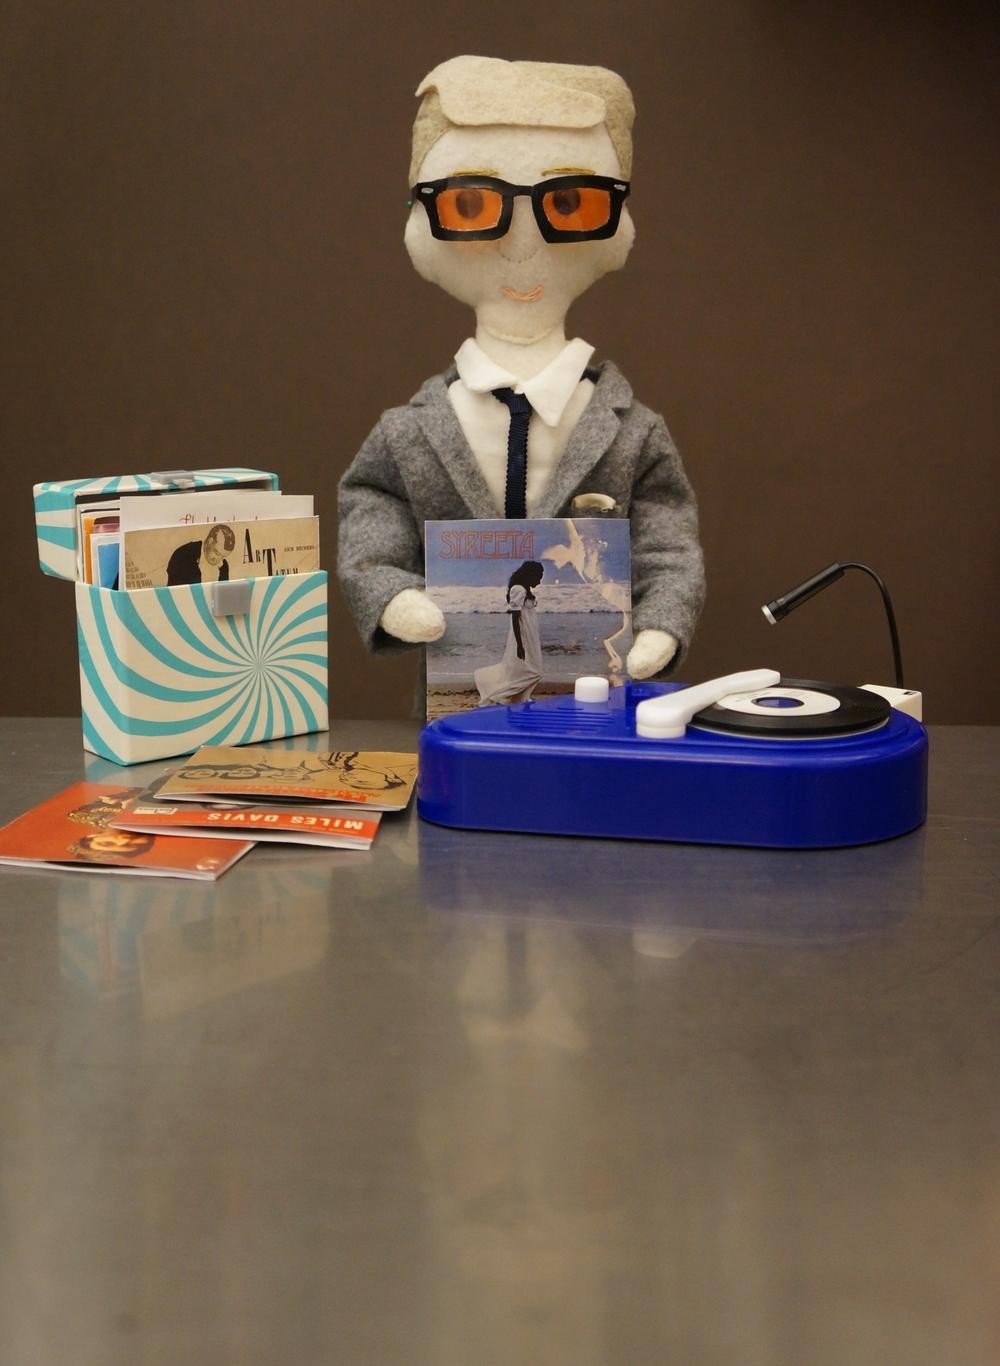 Mini John doll as Martin Freeman